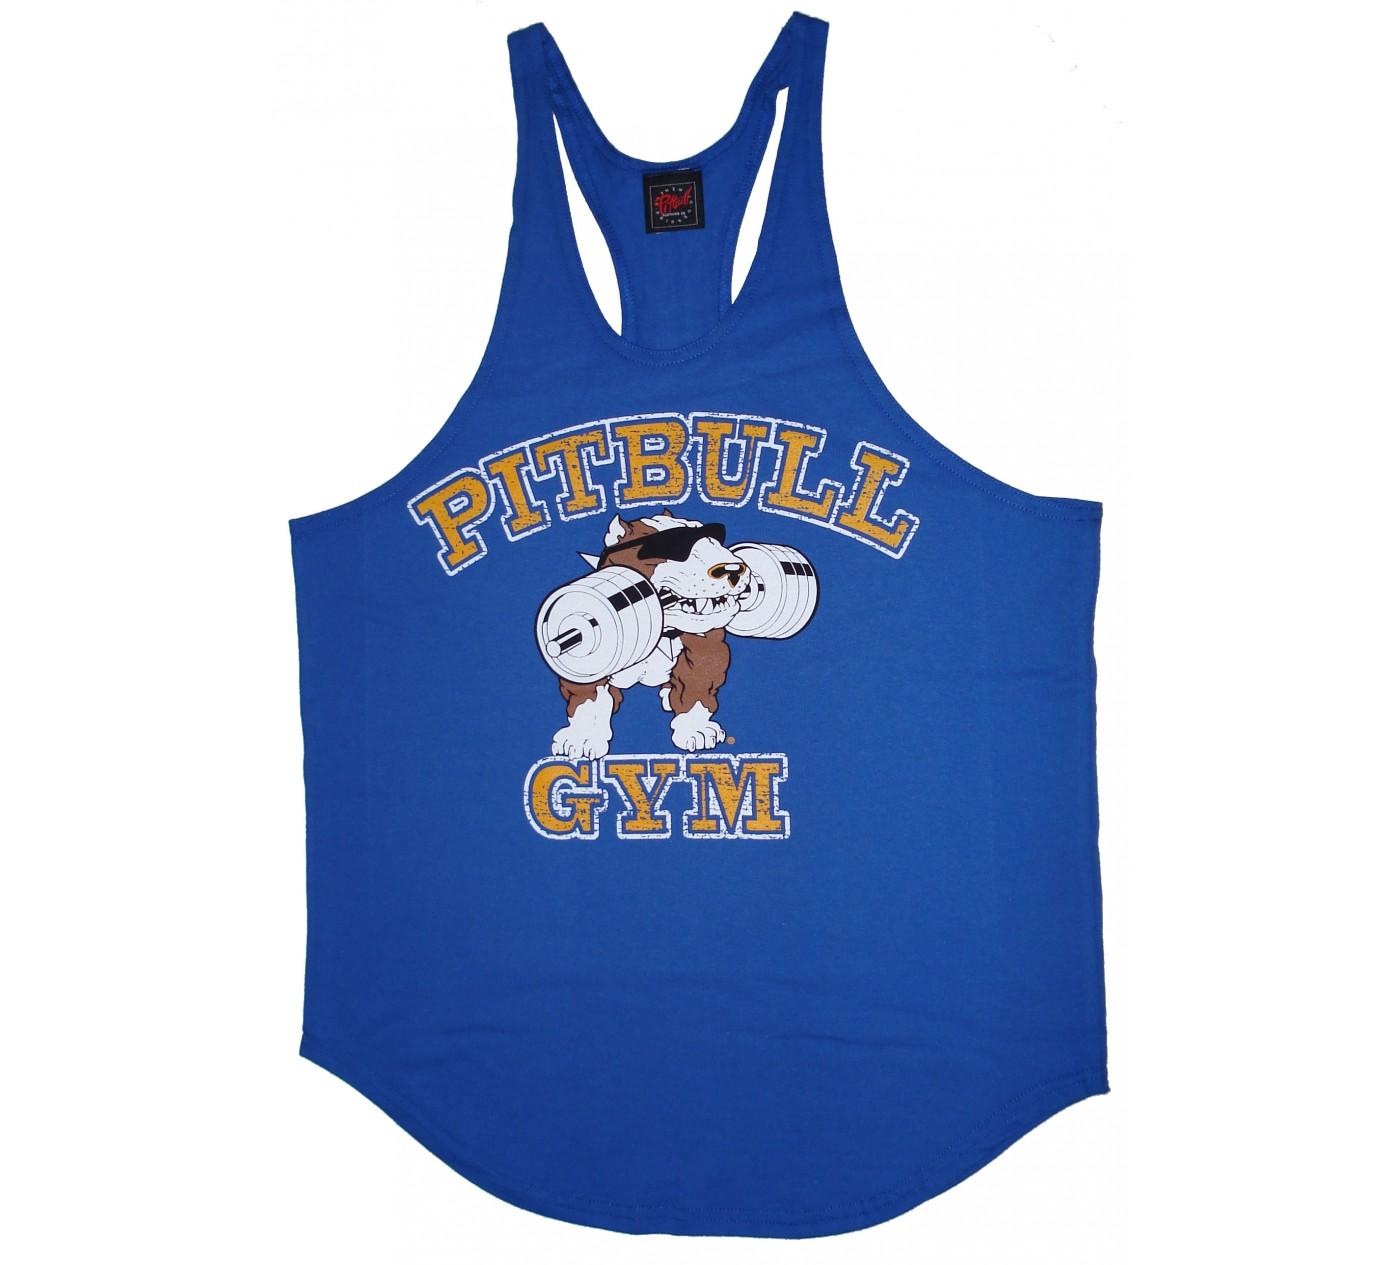 P312 Pitbull Gym streng tank top stein logo